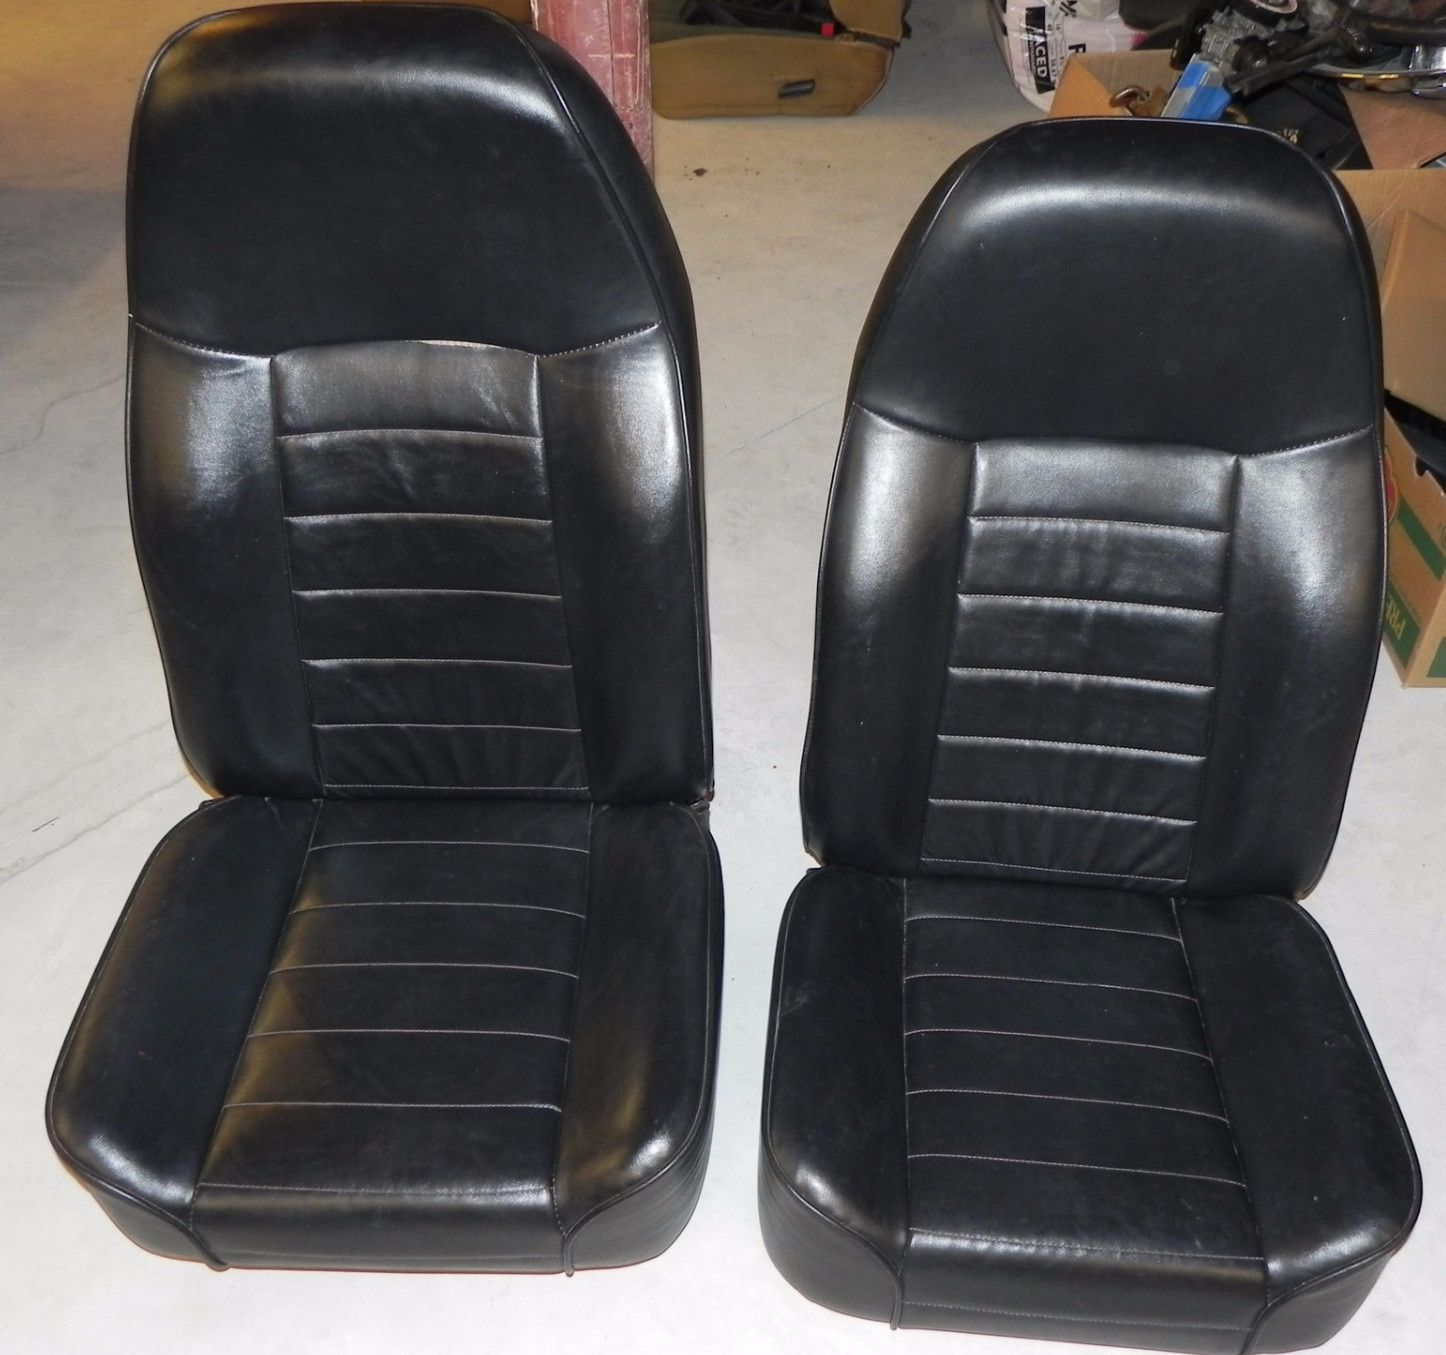 Jeep Wrangler YJ CJ Front Black Leather Seats Pair